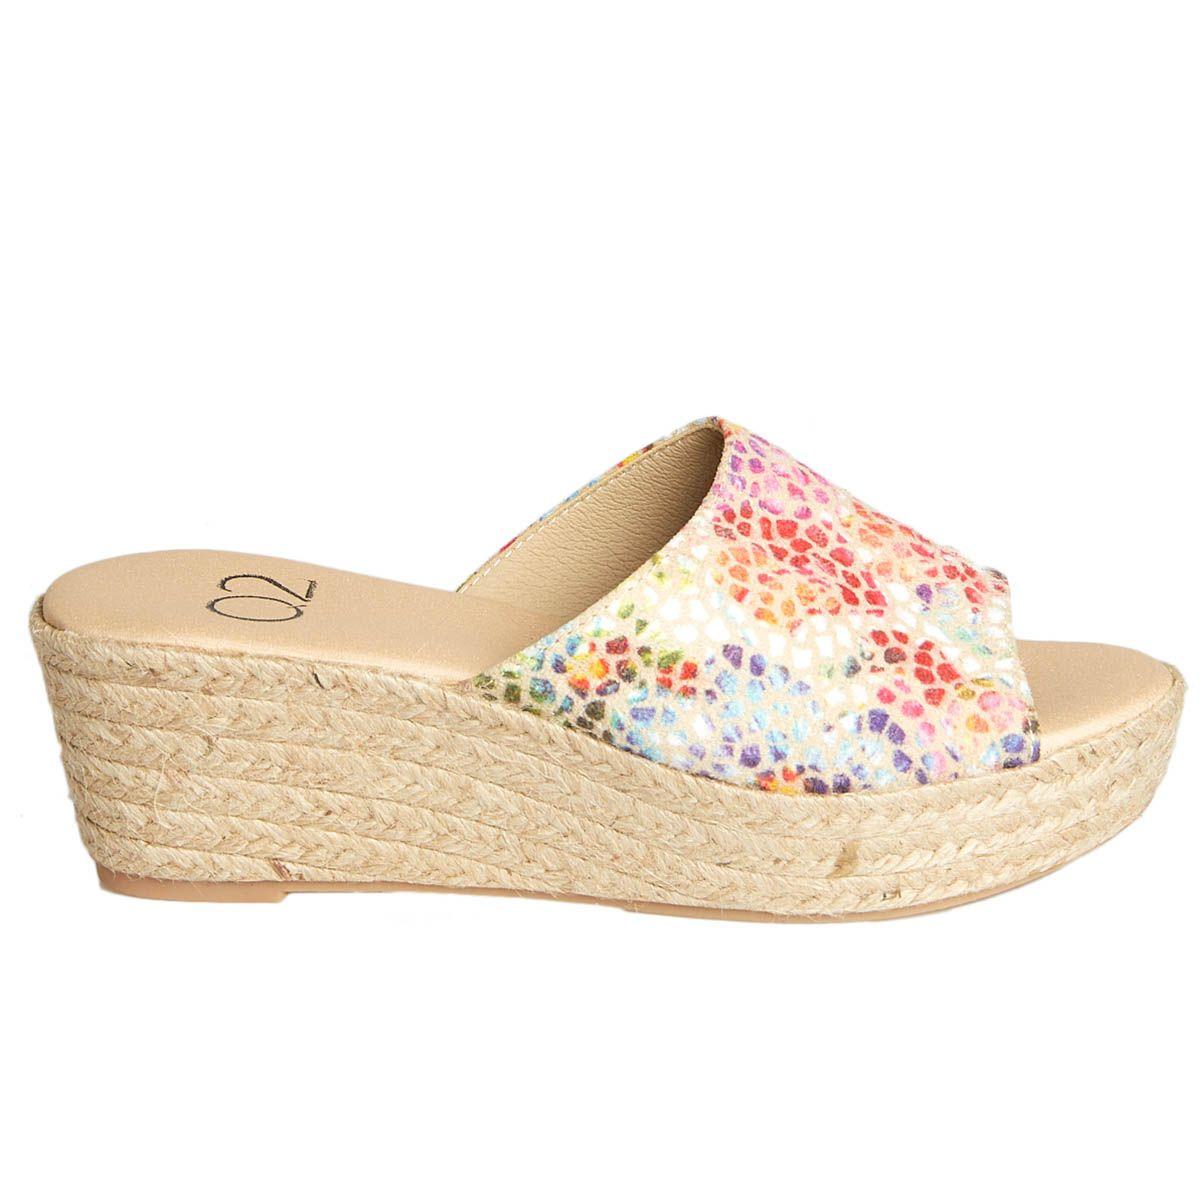 Leindia Sparto Wedge Sandal in Multicolour